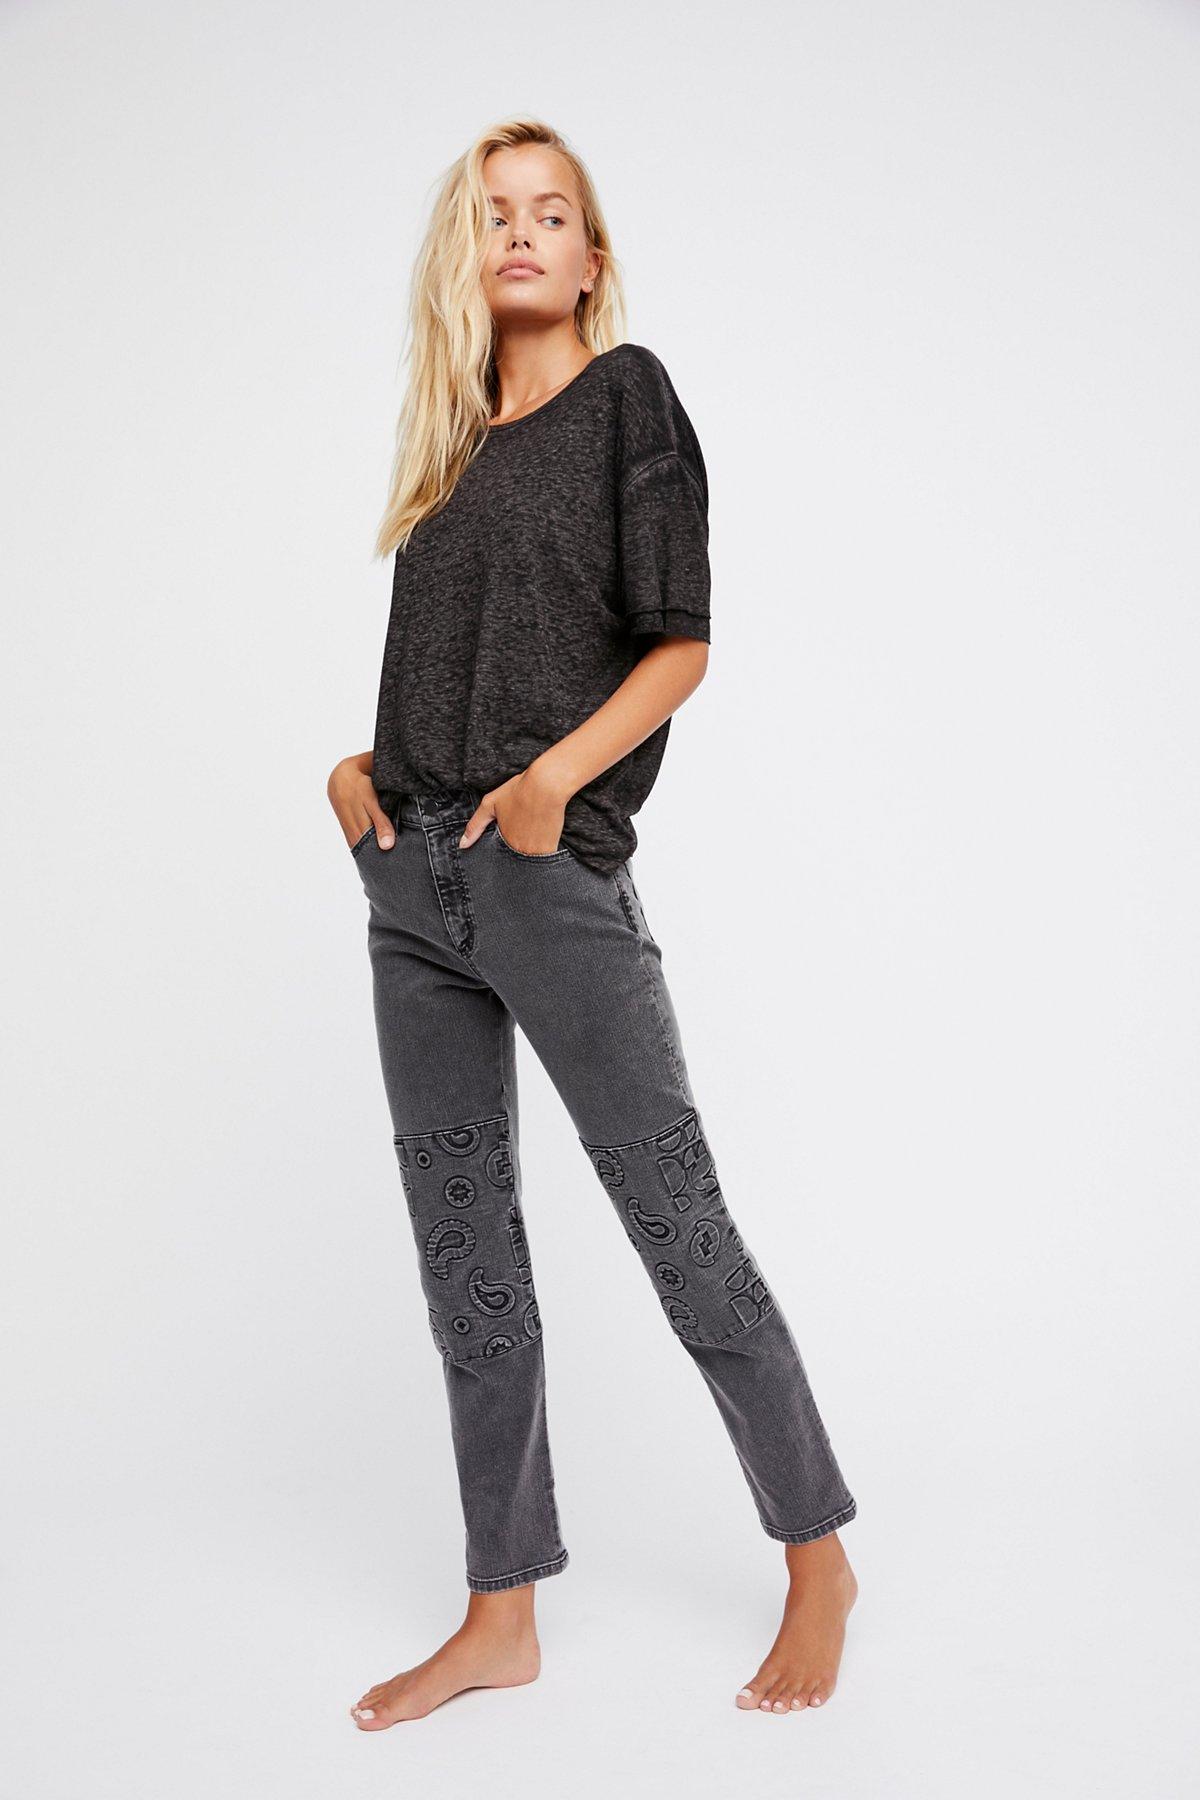 Embossed Paisley Patti Straight Jeans